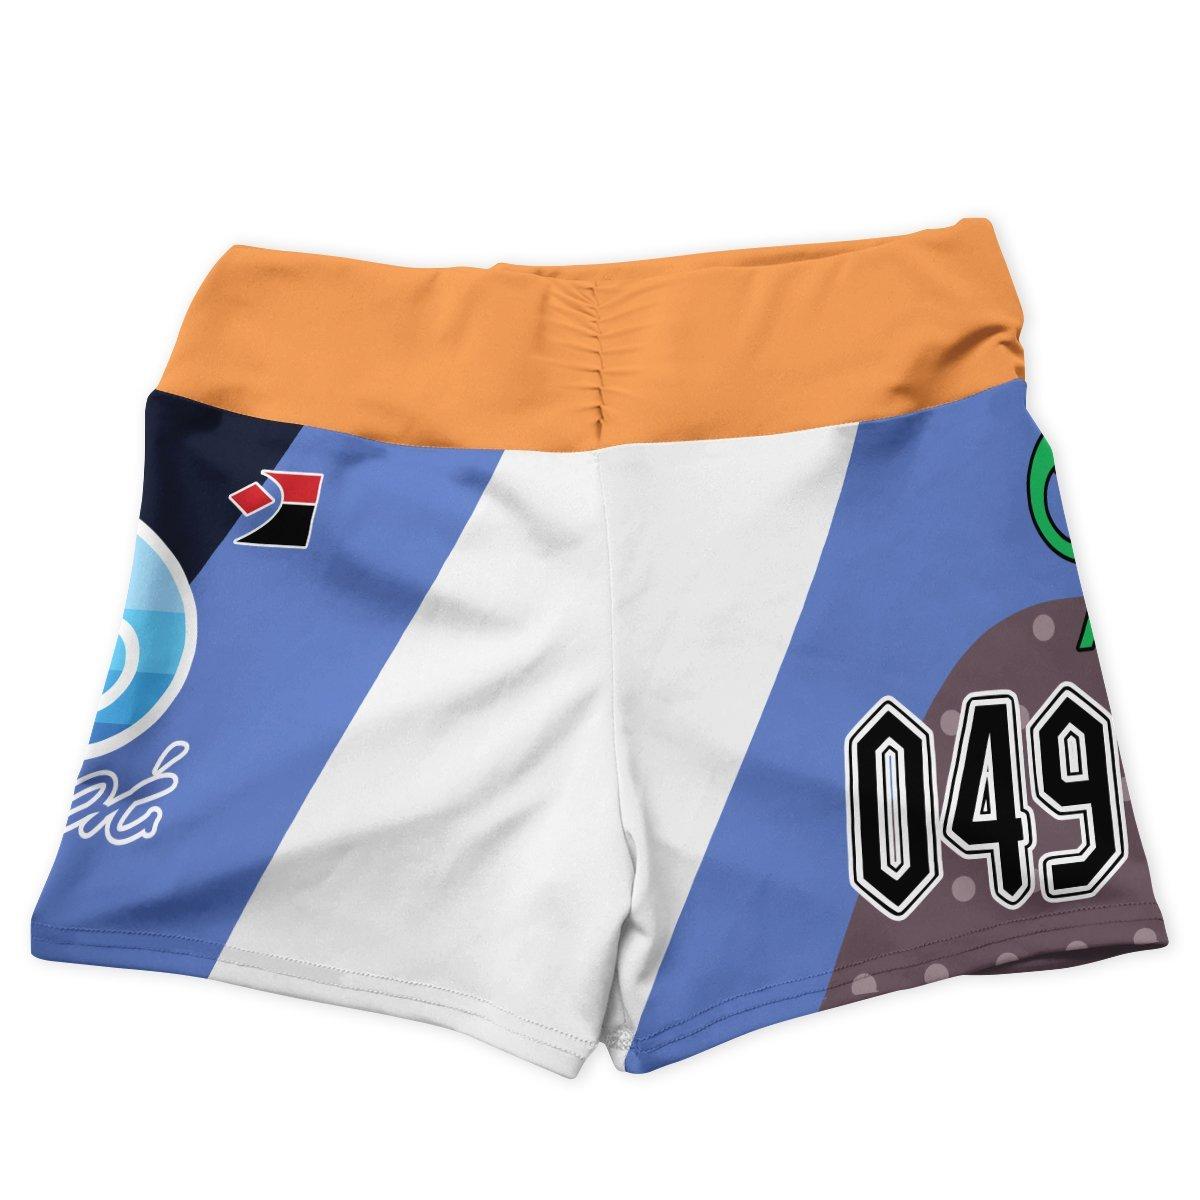 pokemon water uniform active wear set 381204 - Anime Swimsuits